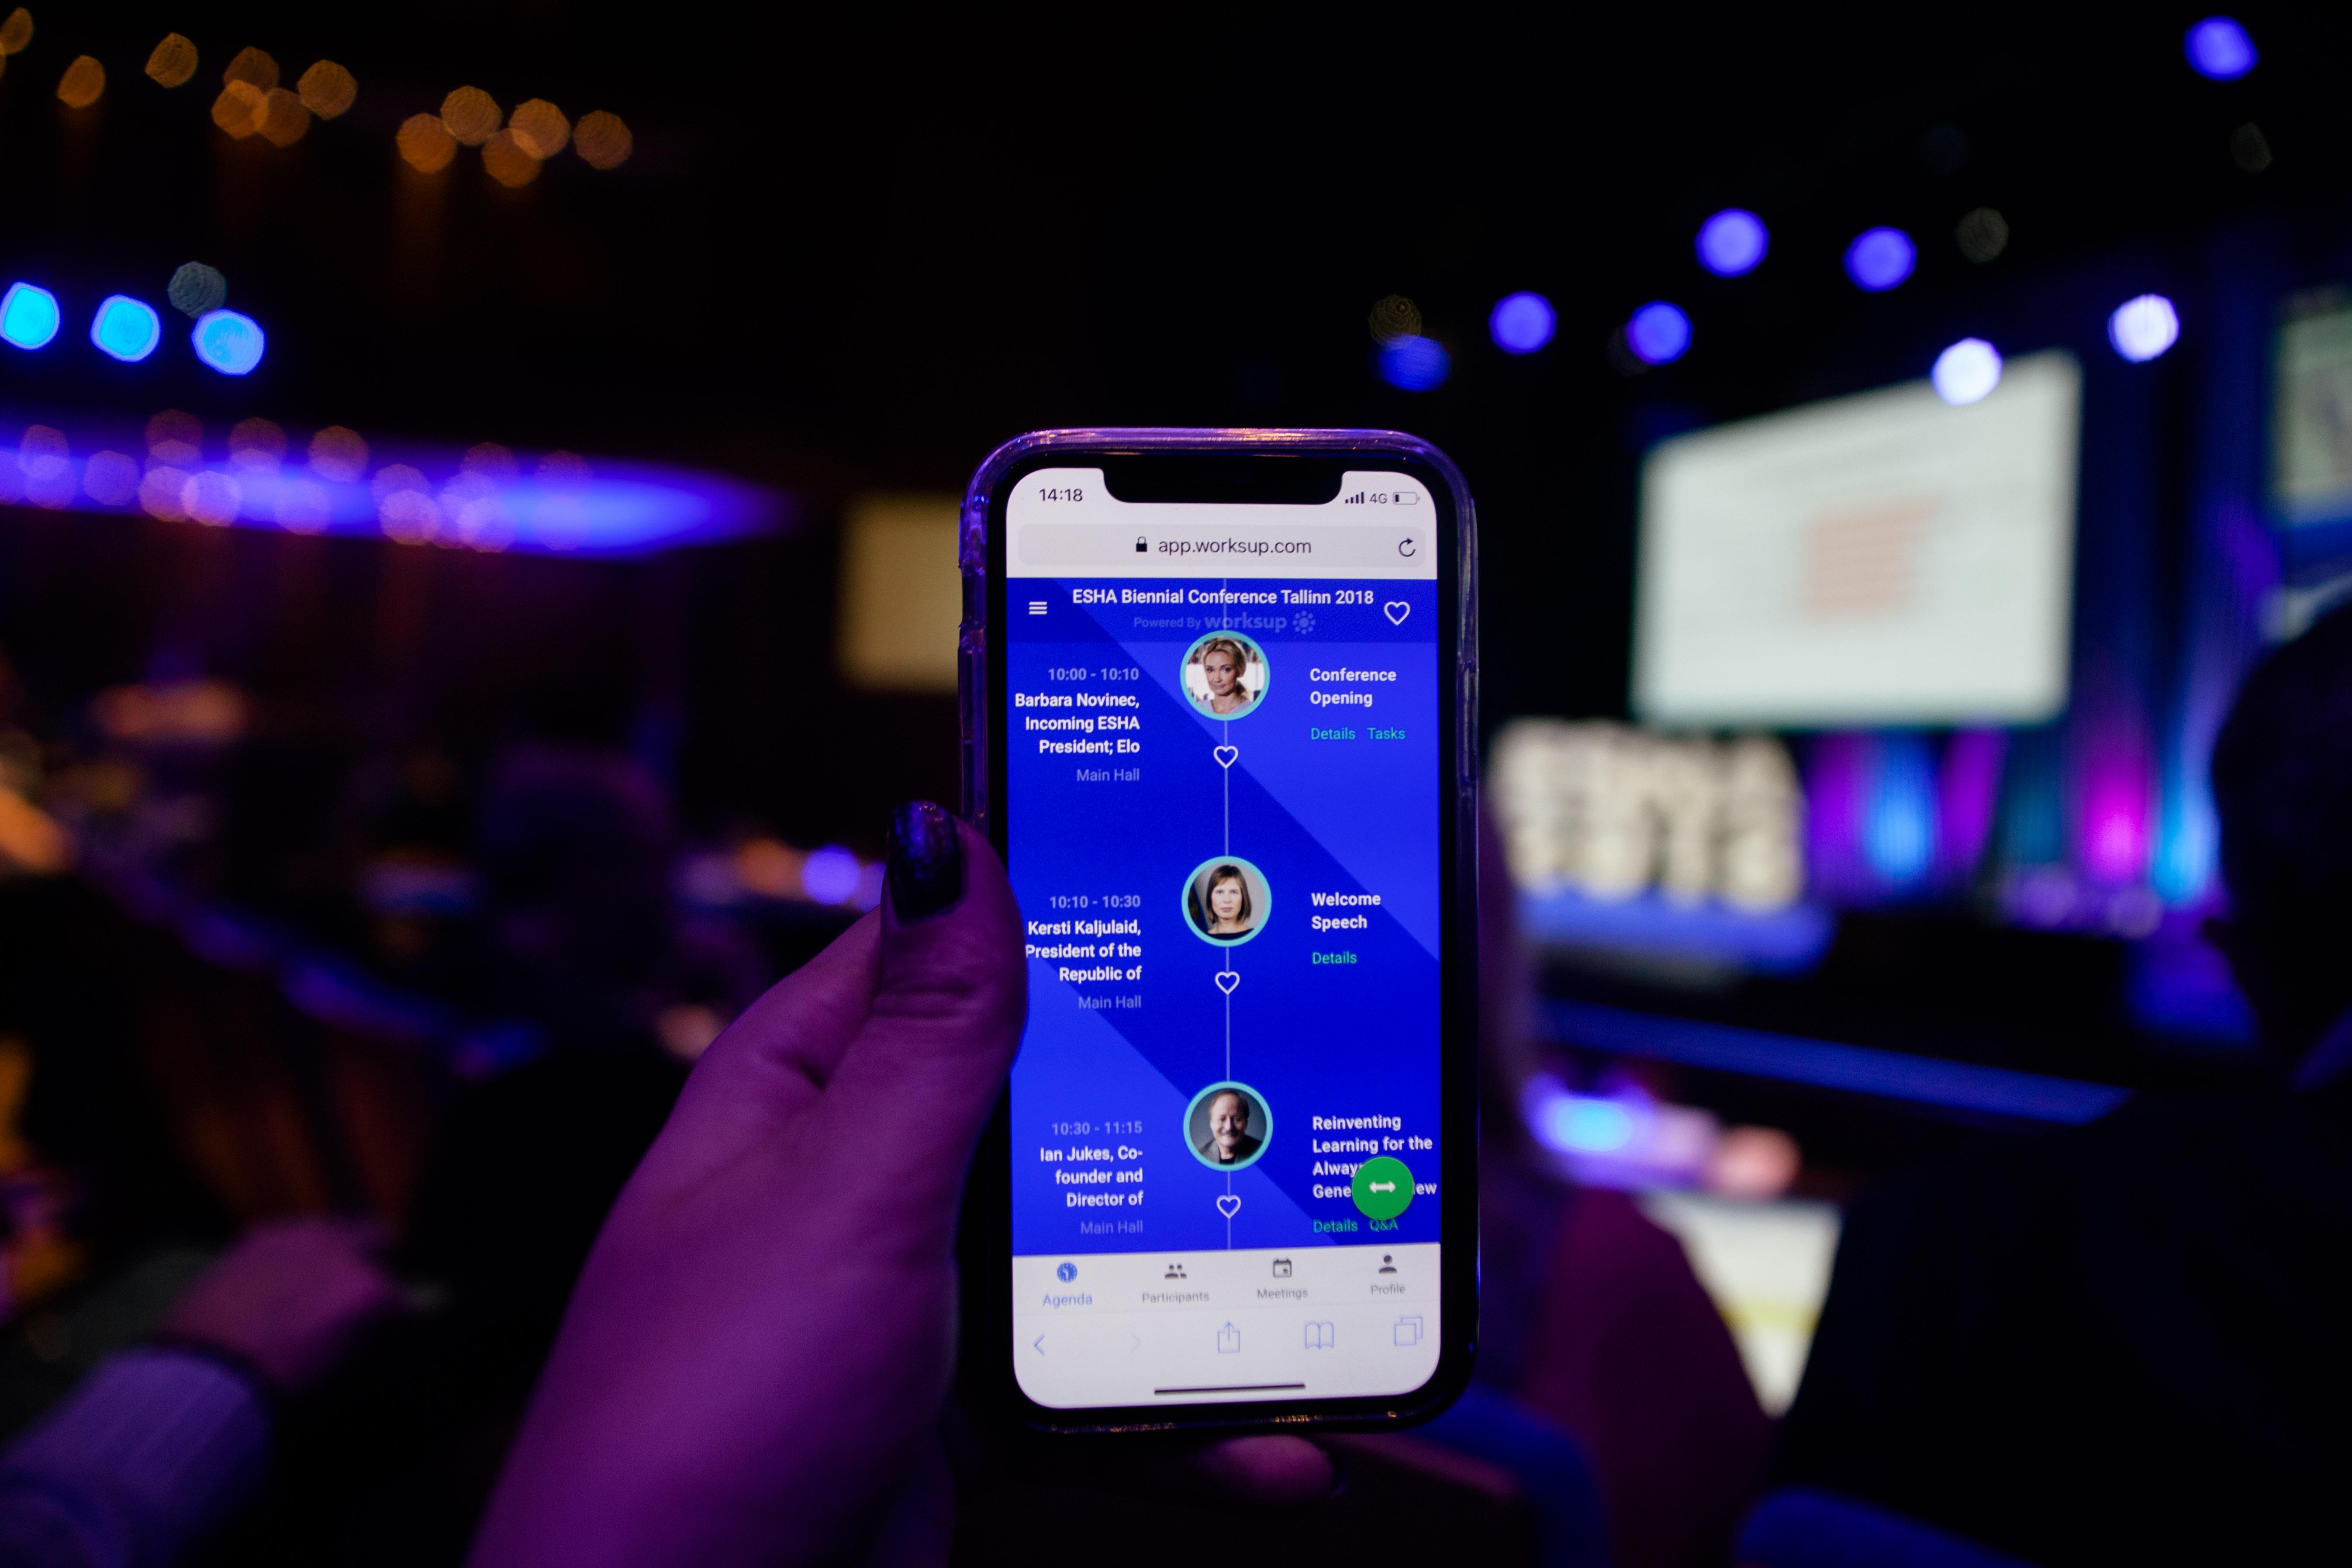 event app, mobile event app, conference app, best event apps